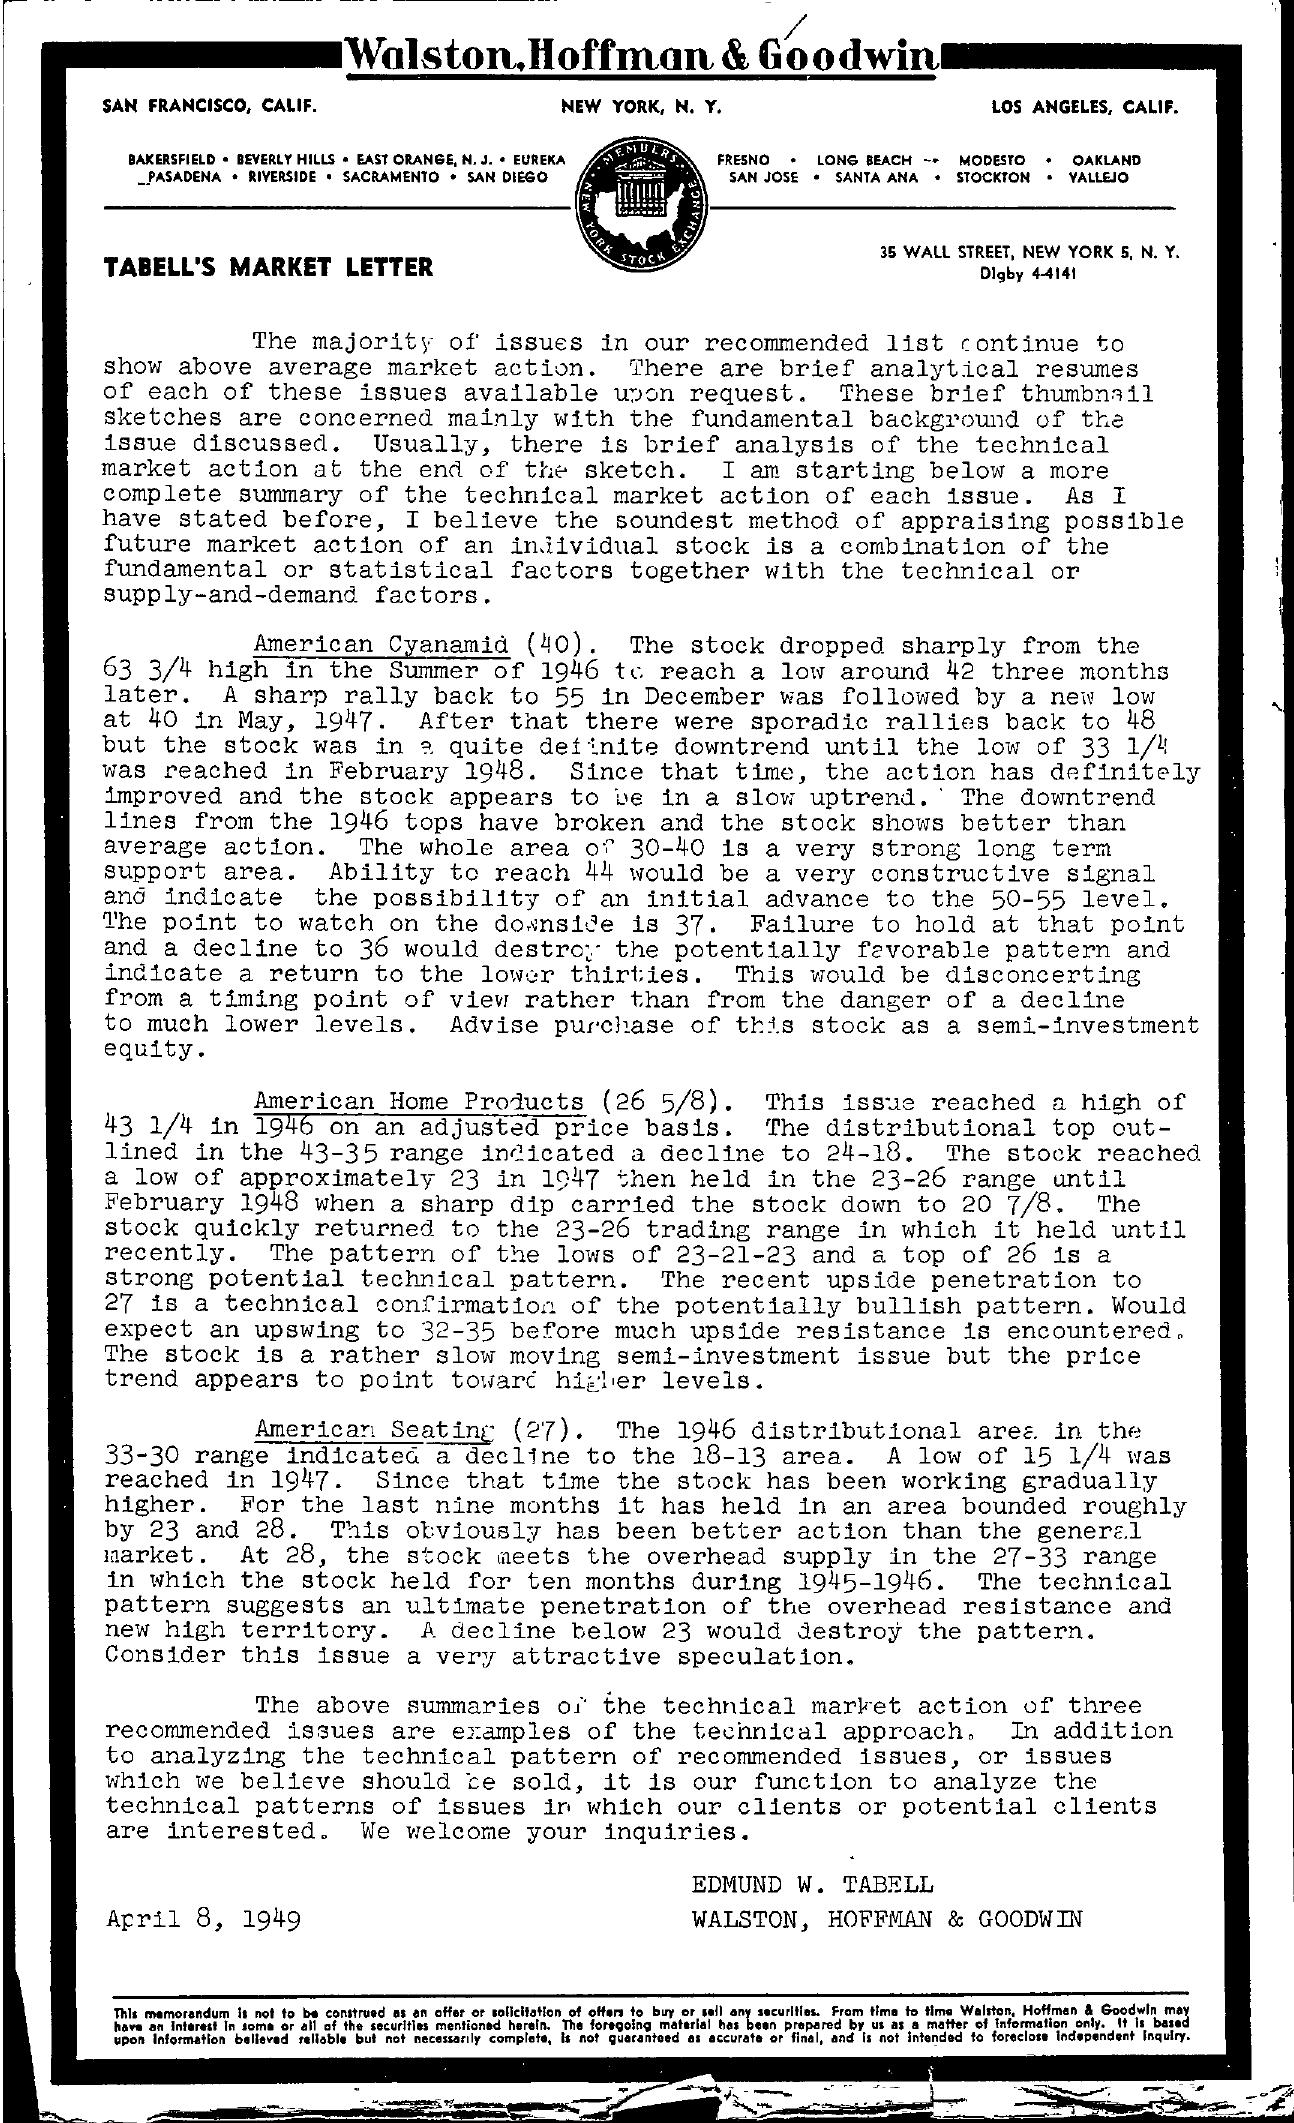 Tabell's Market Letter - April 08, 1949